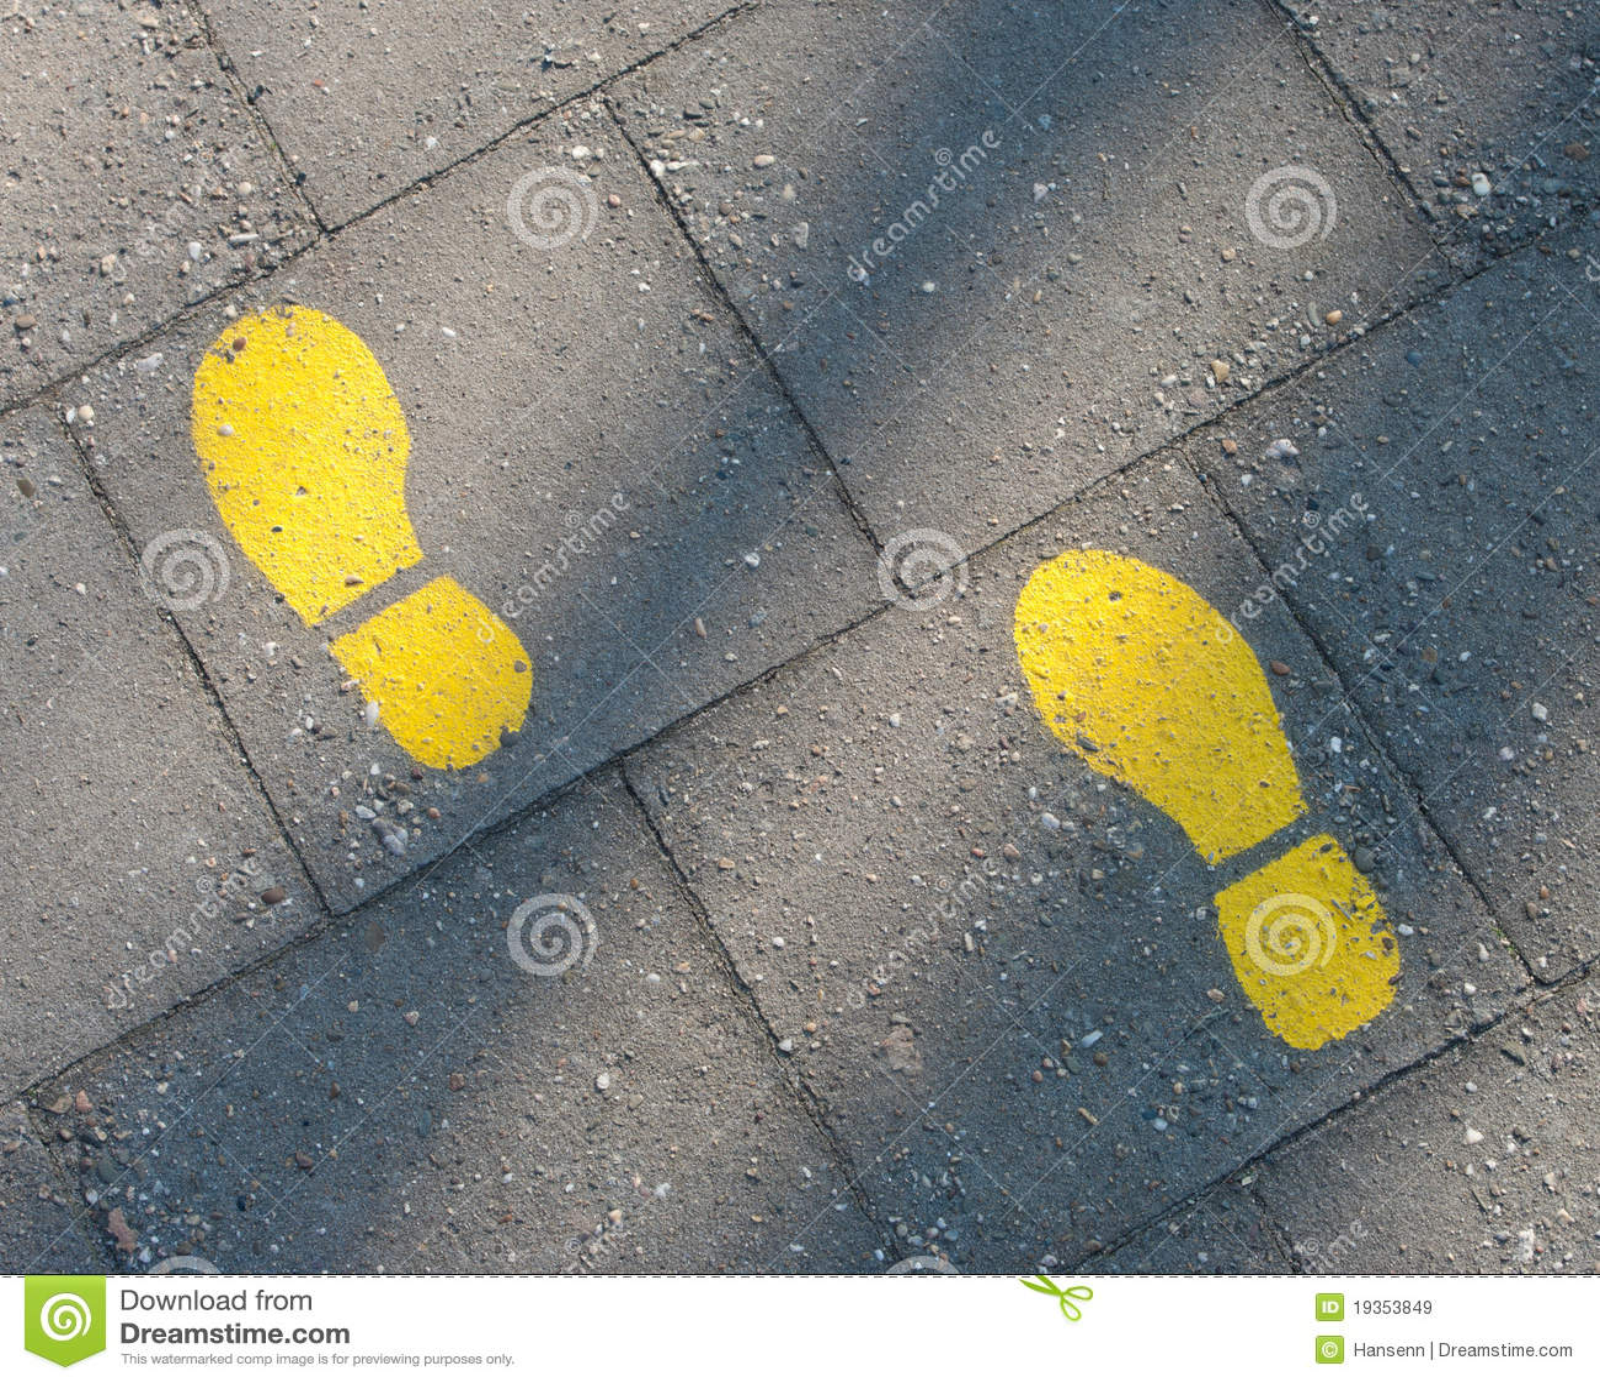 Passos amarelos